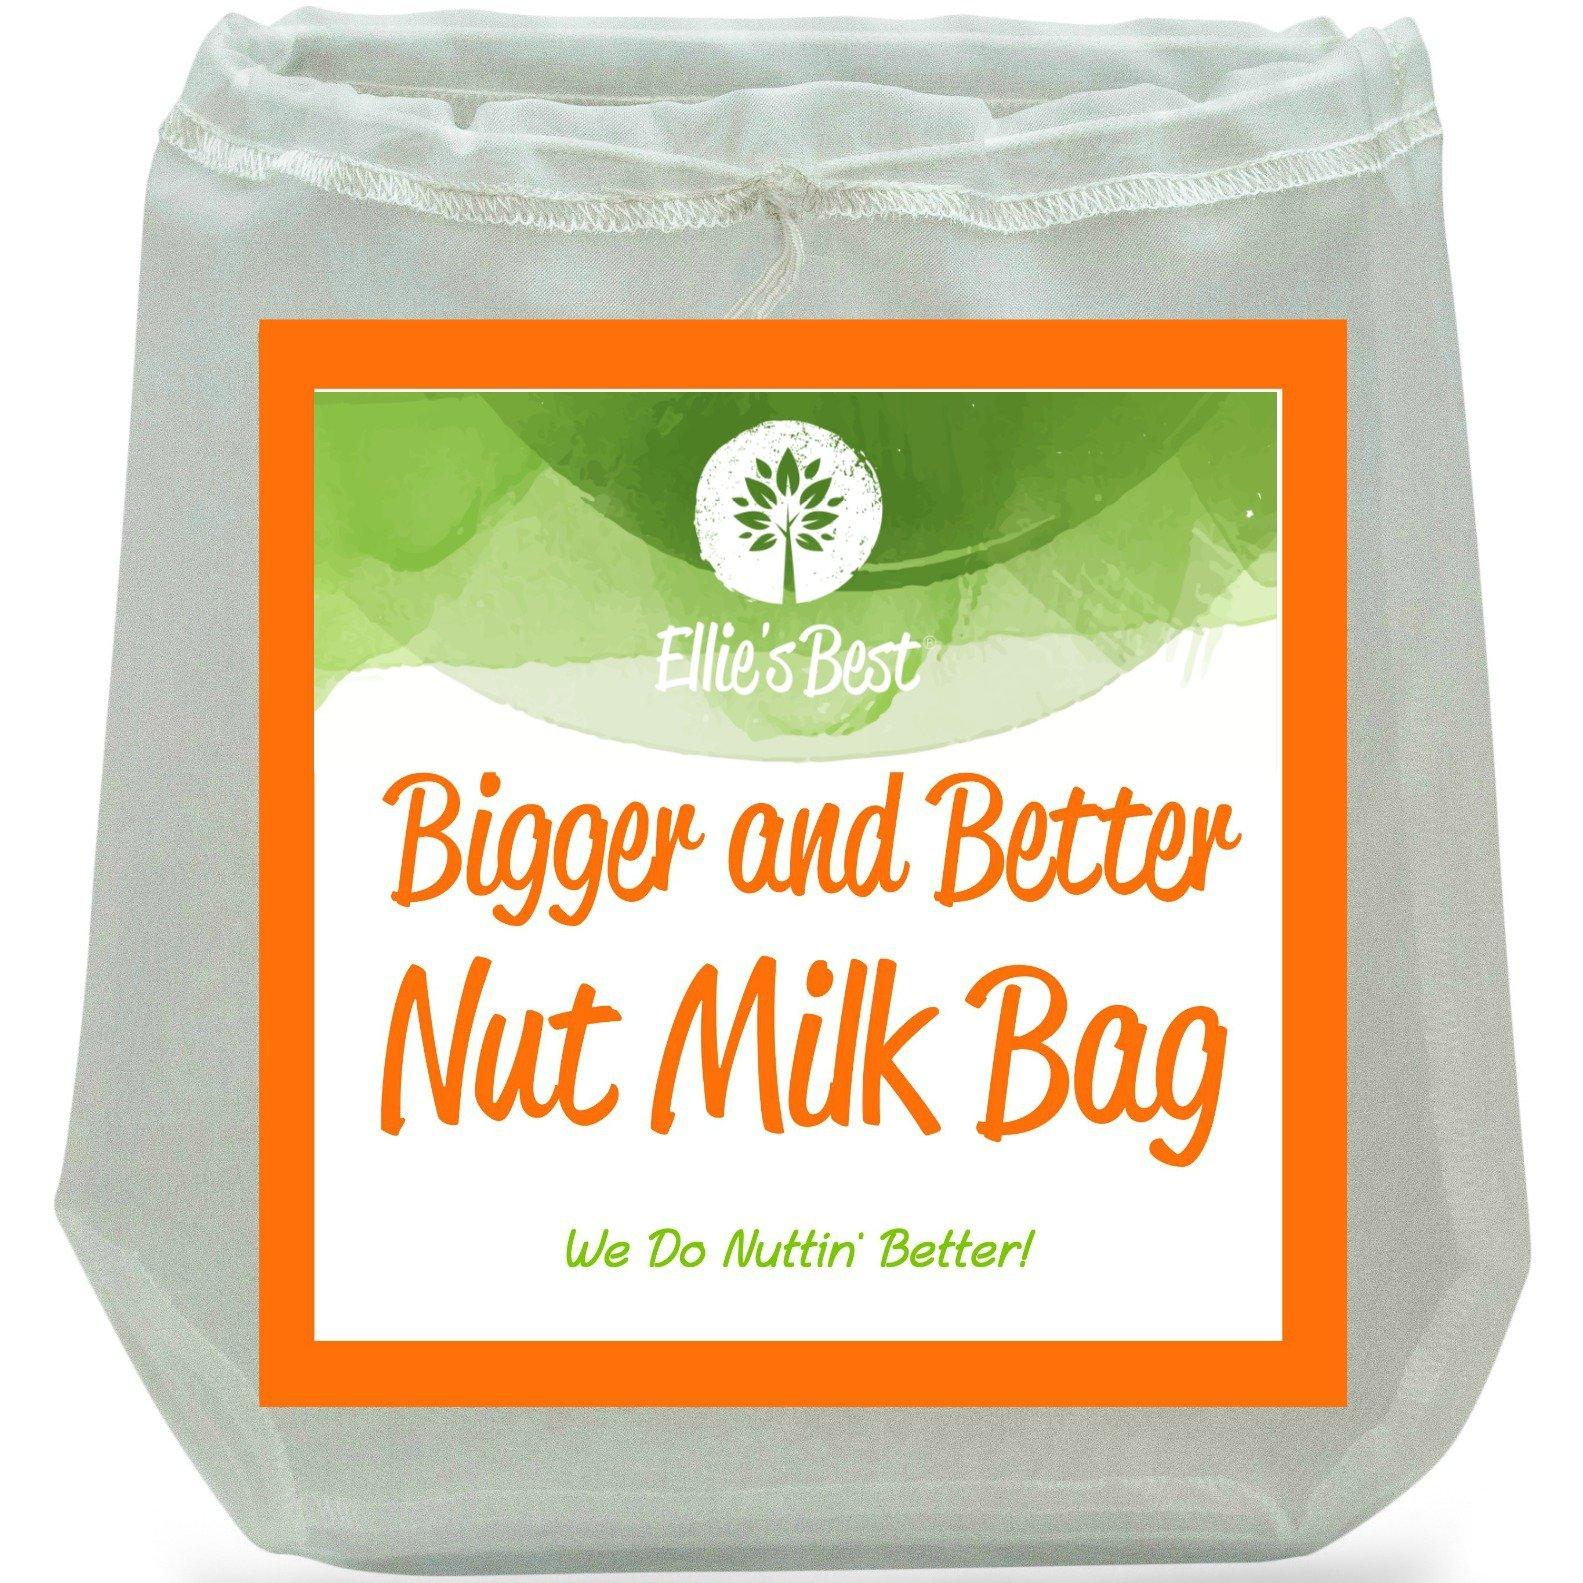 Pro Quality Nut Milk Bag Big 12 X12 Commercial Grade